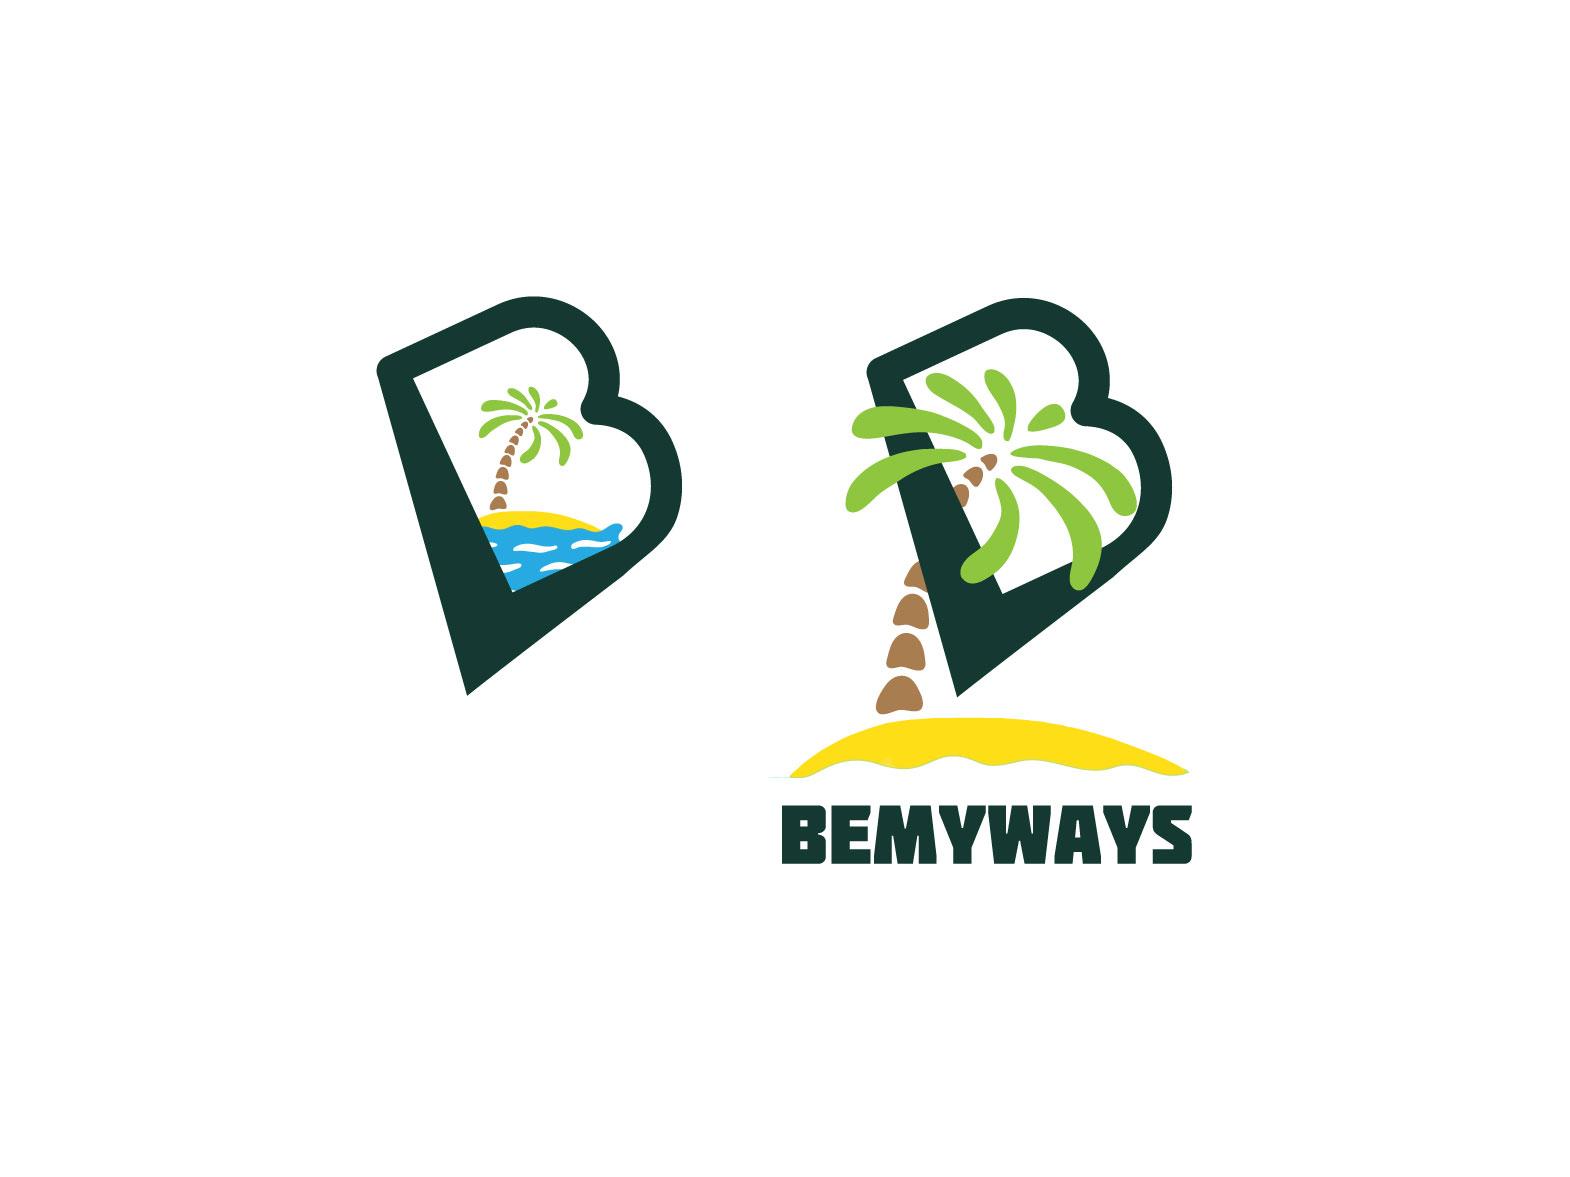 Разработка логотипа и иконки для Travel Video Platform фото f_2895c3975f90145d.jpg